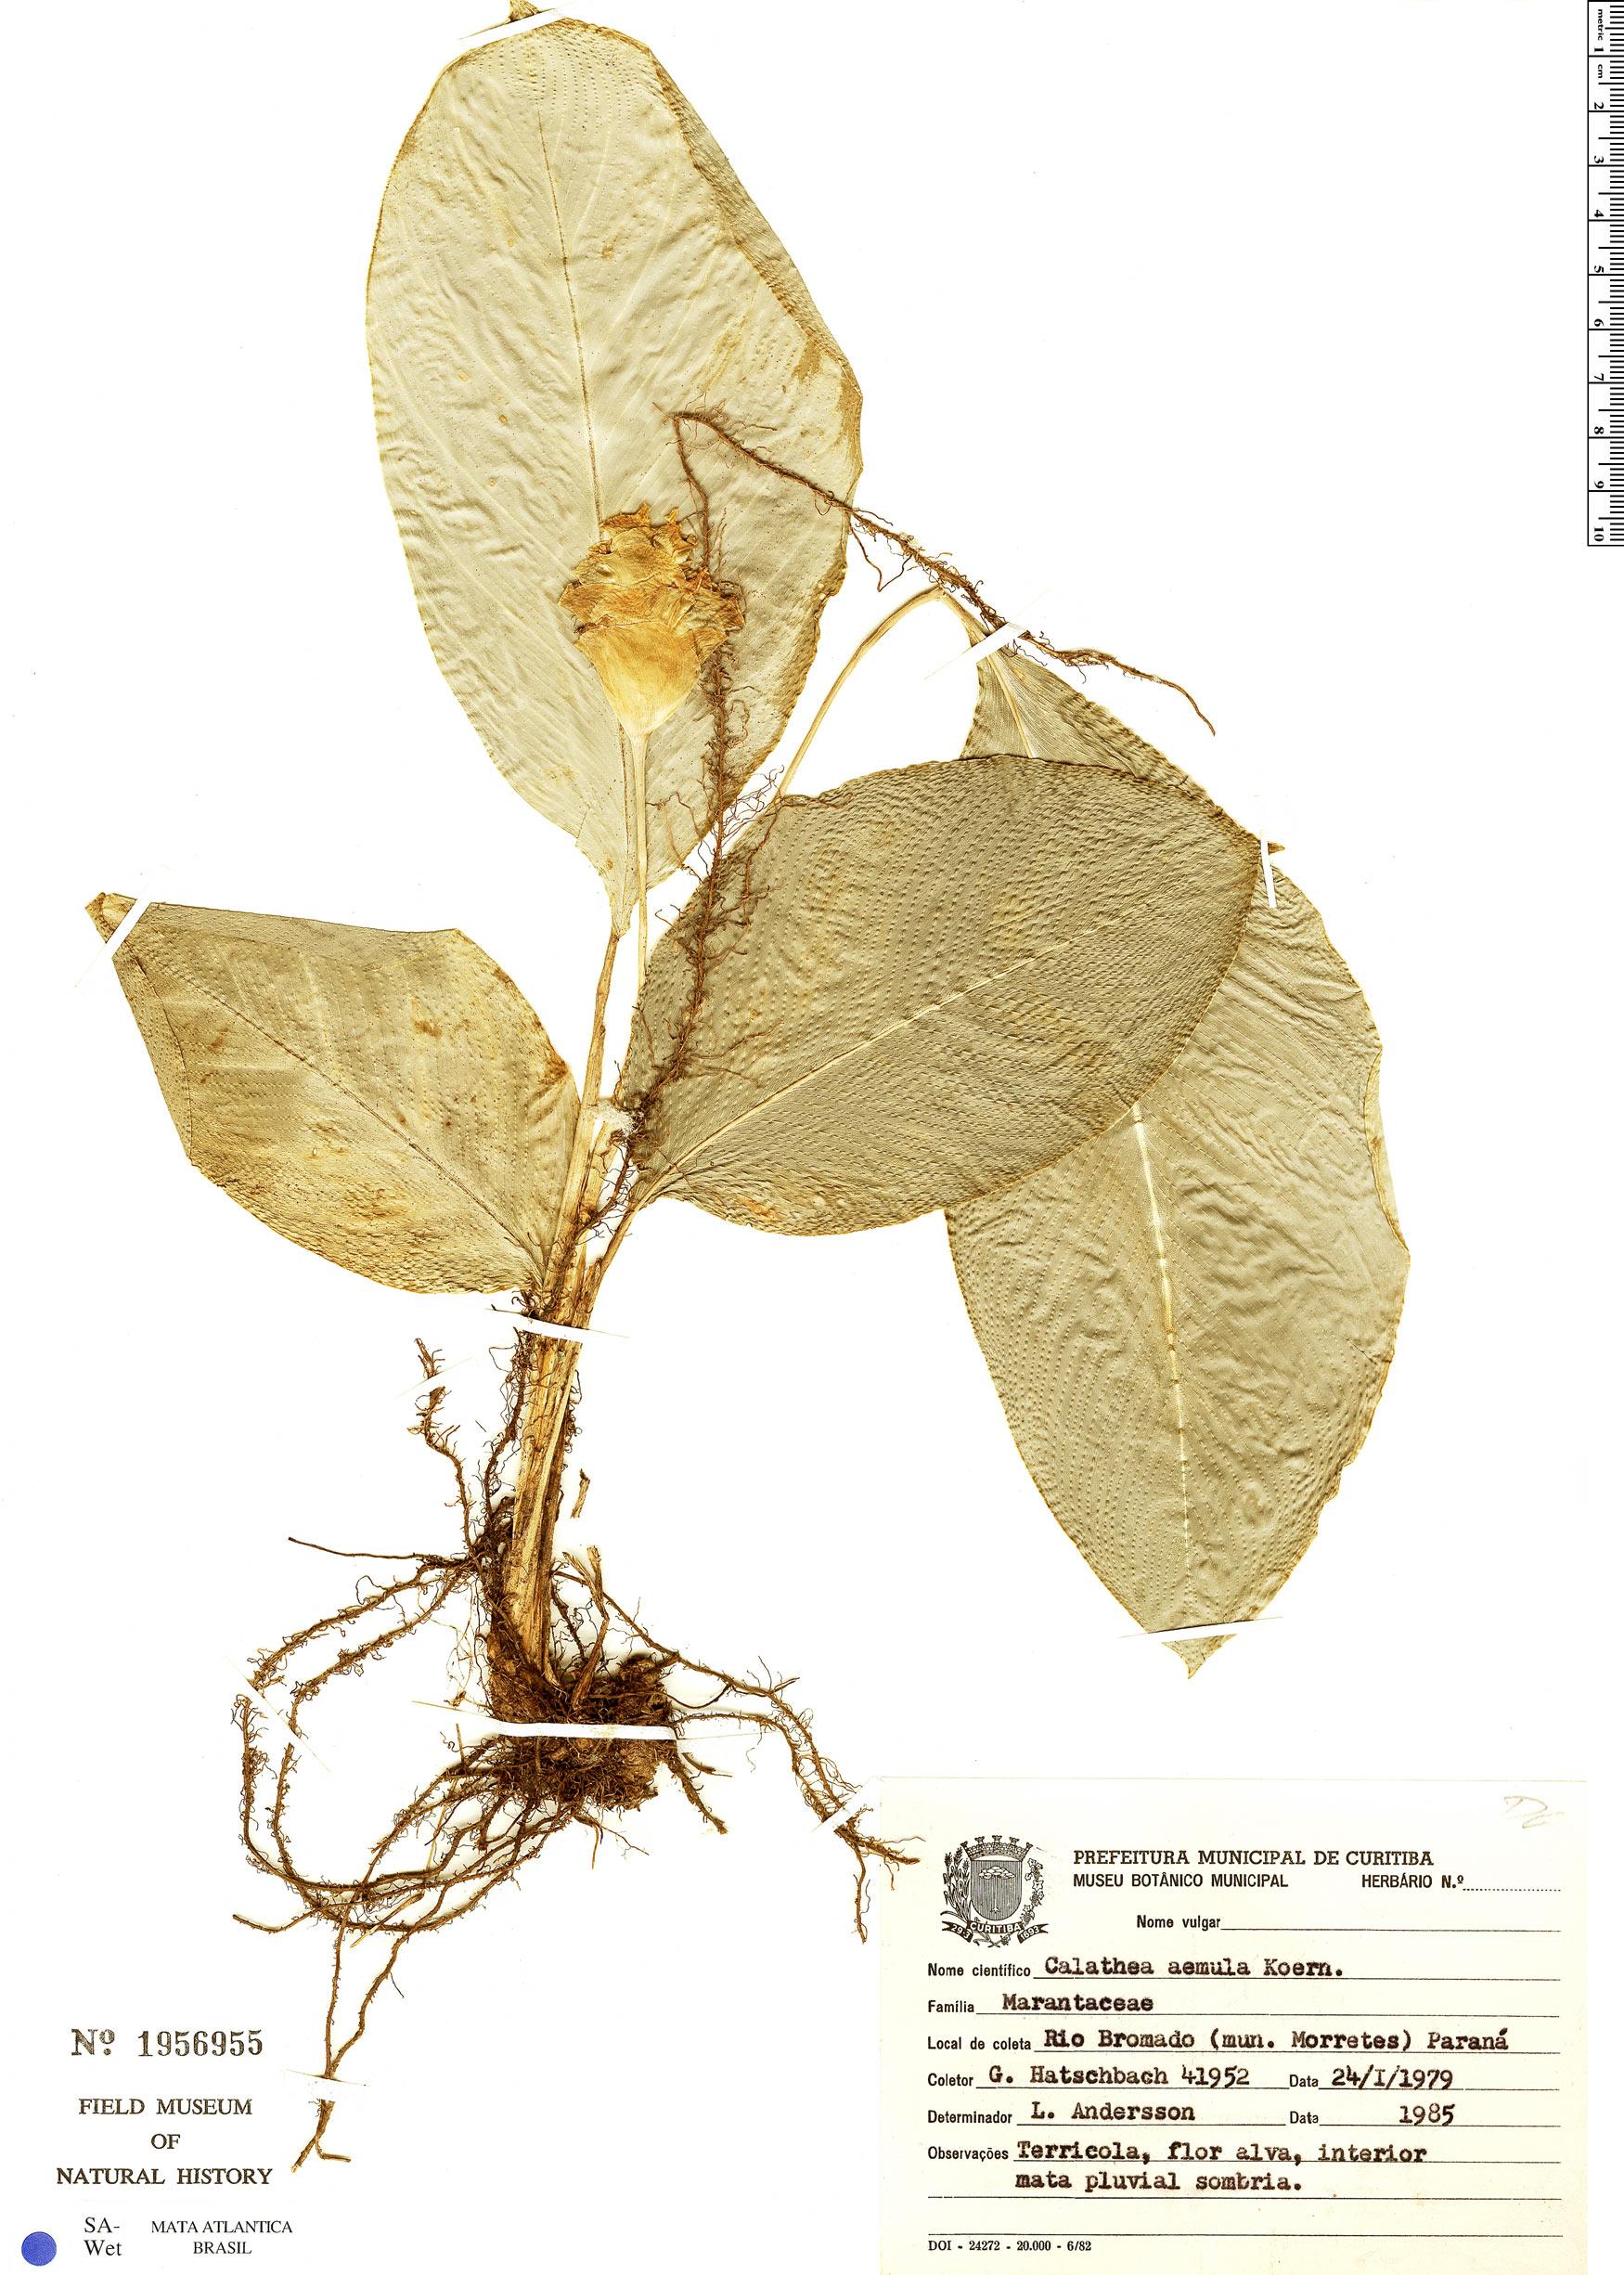 Specimen: Calathea aemula